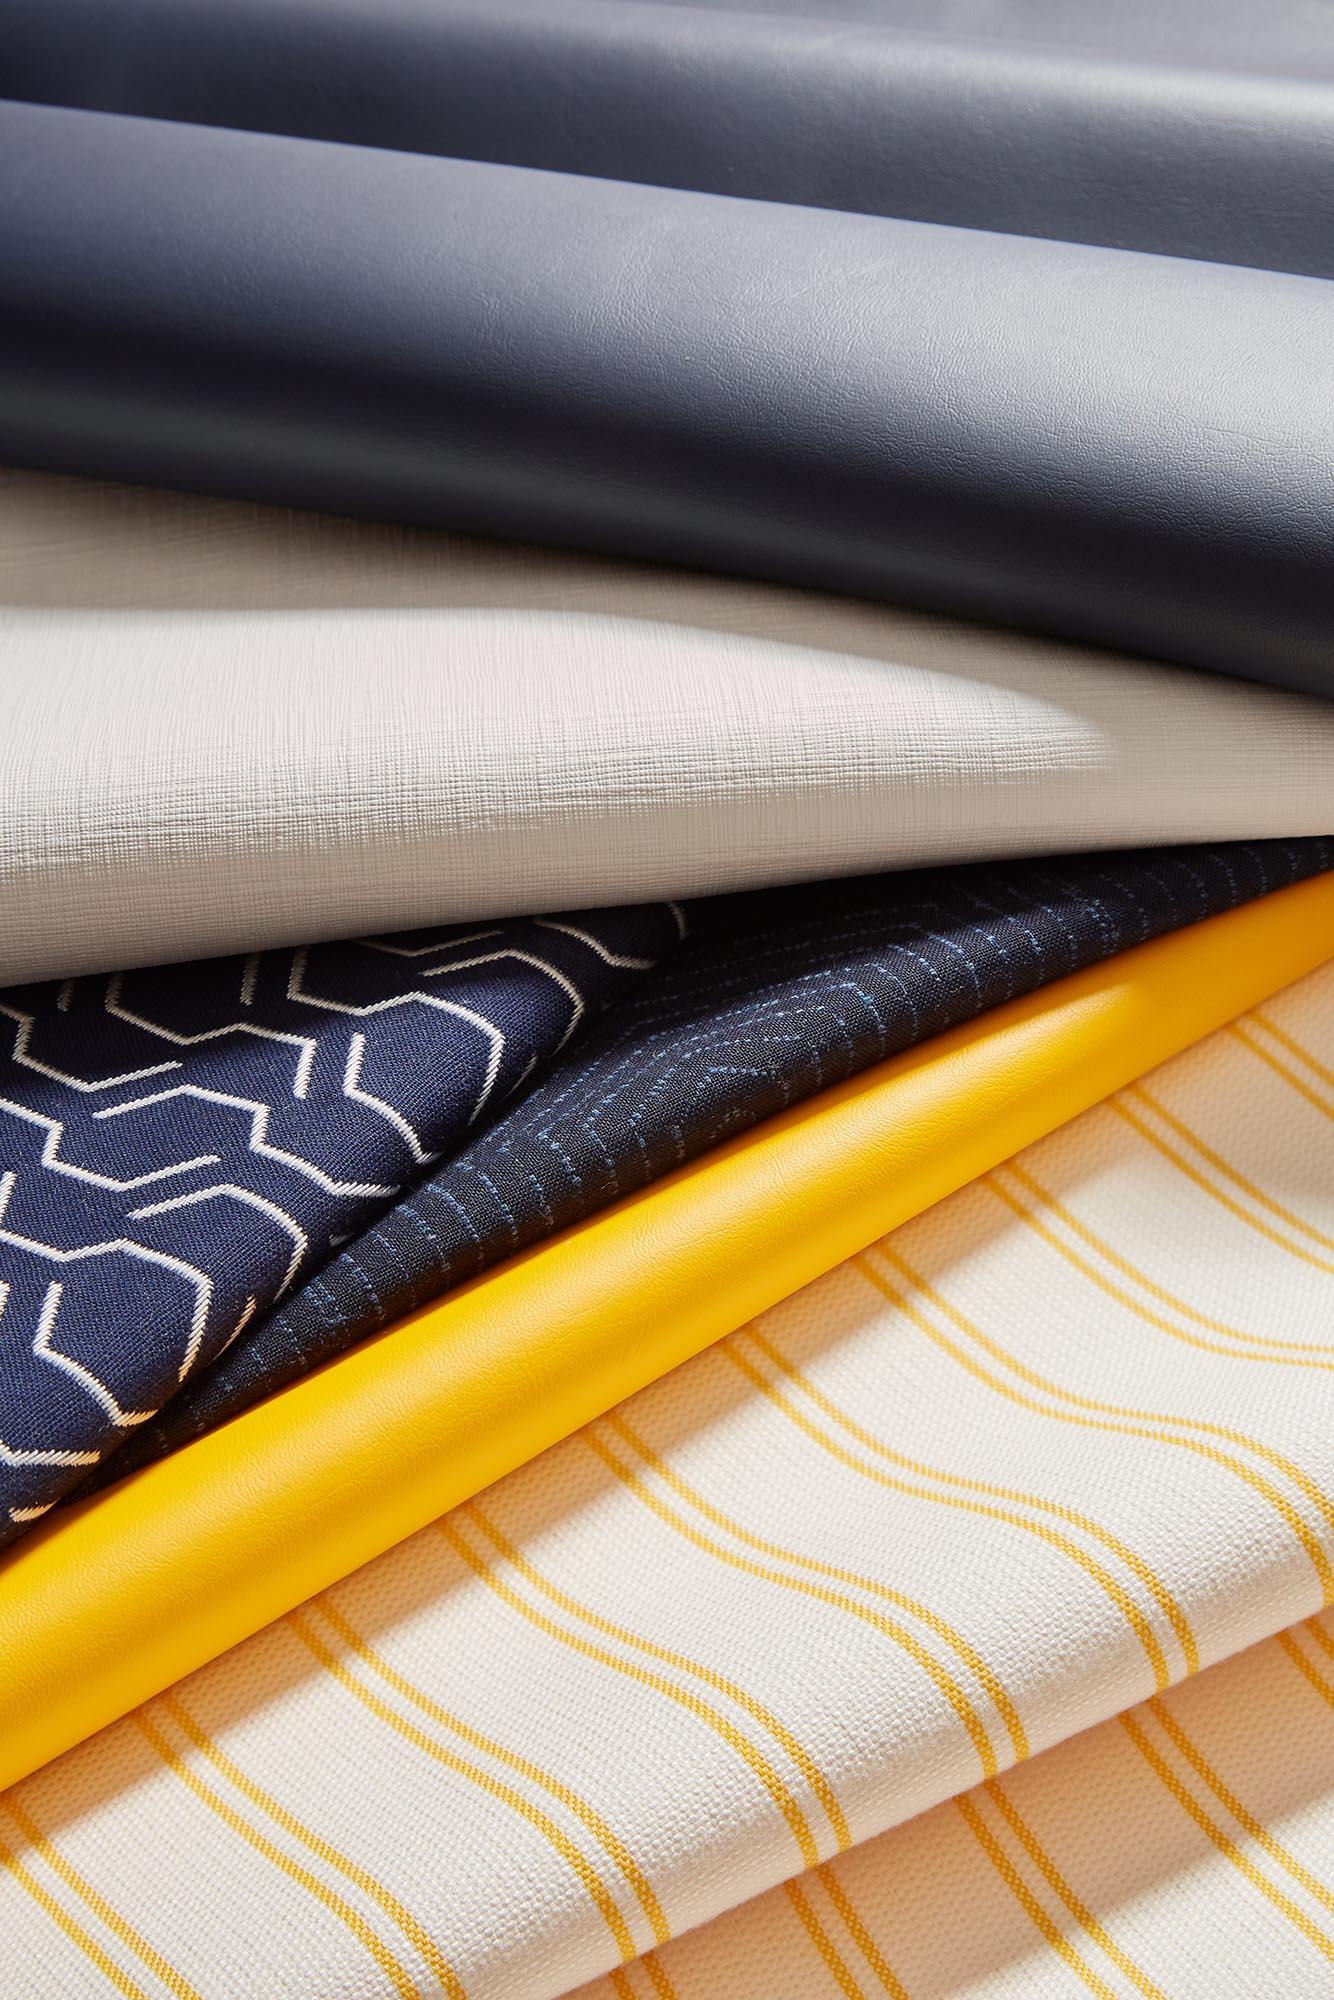 Sunbrella Marine Upholstery Collection, Blue and Yellow Fabrics